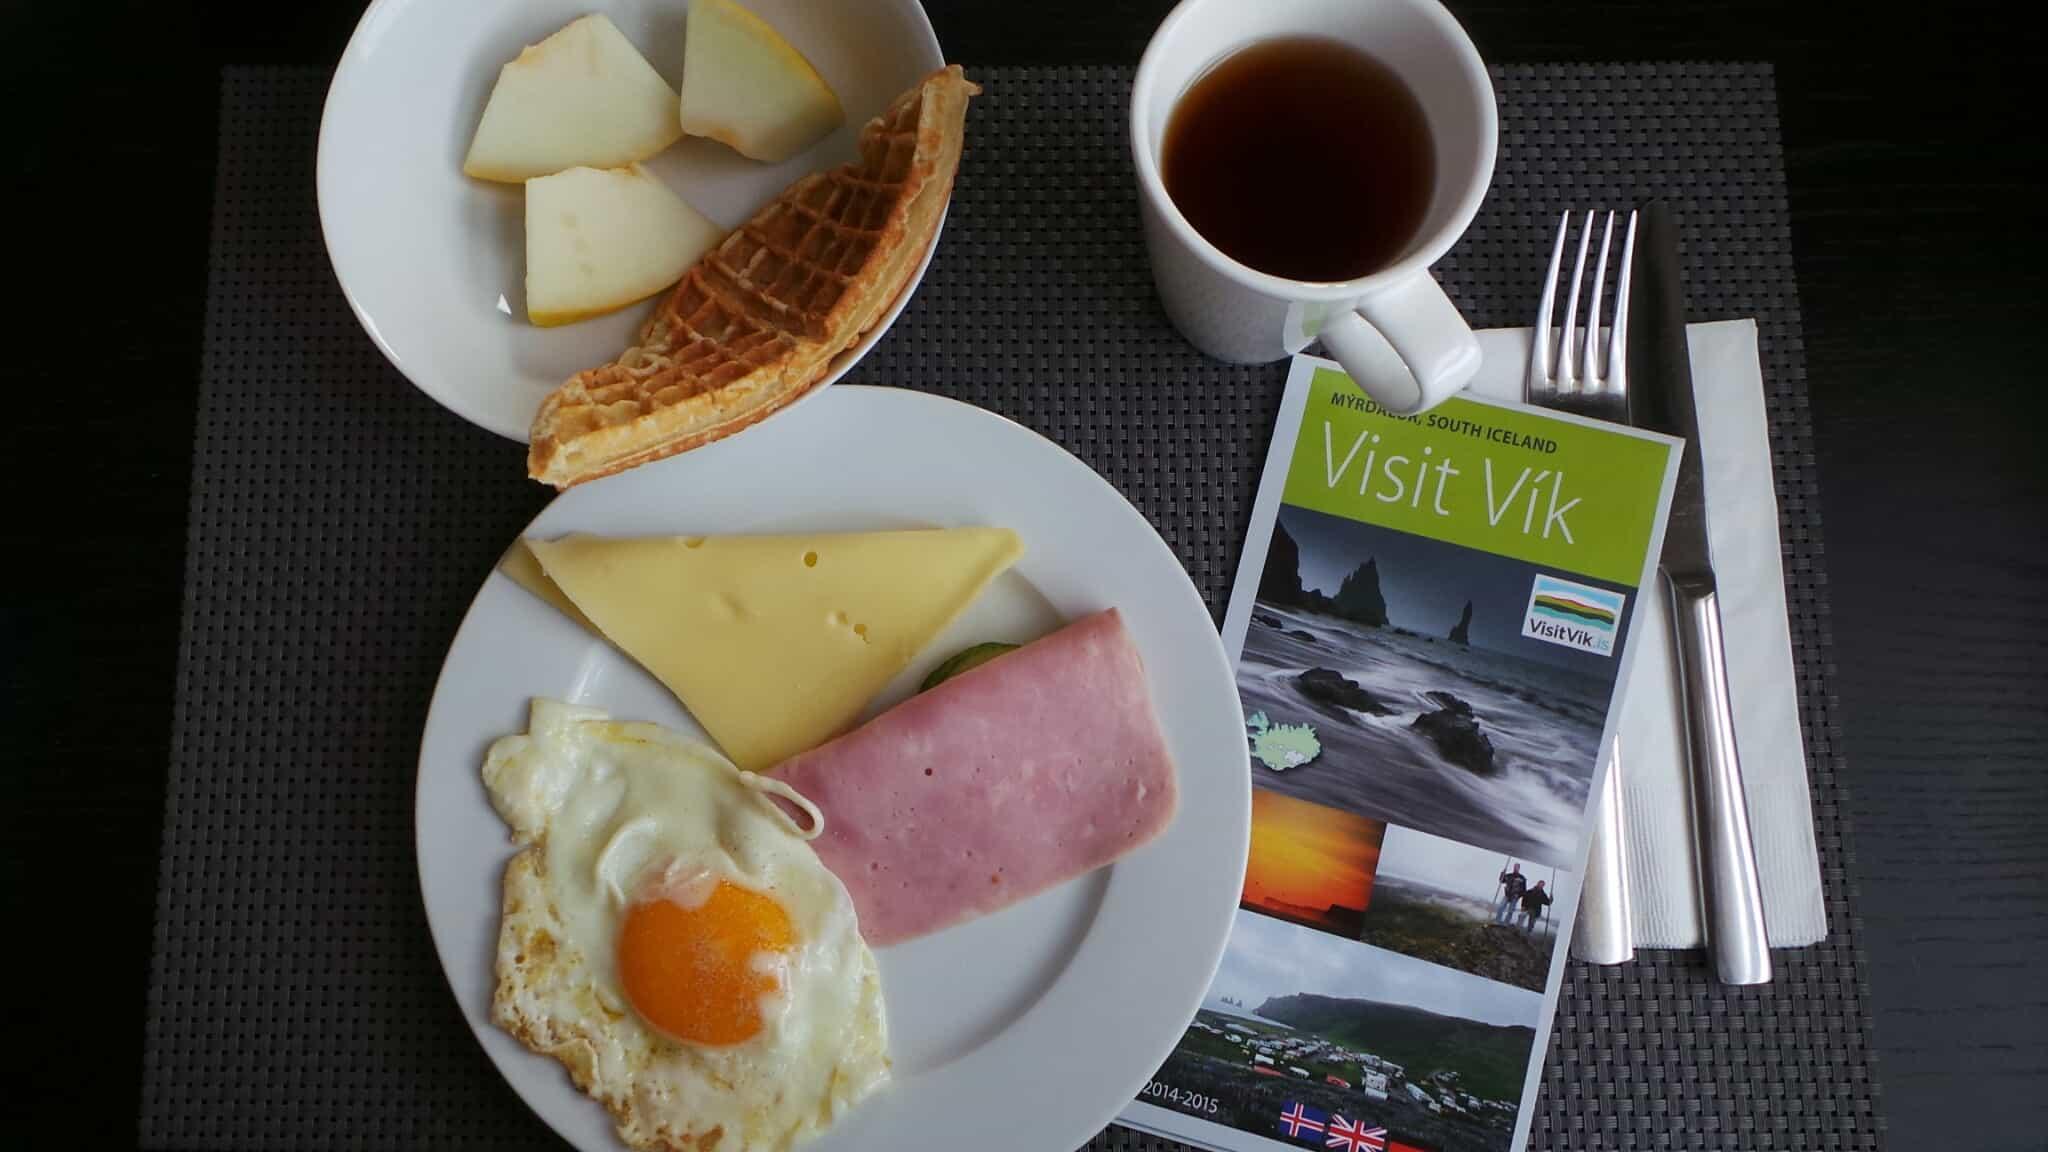 Petit déjeuner à l'hôtel Volcano à Vik en Islande